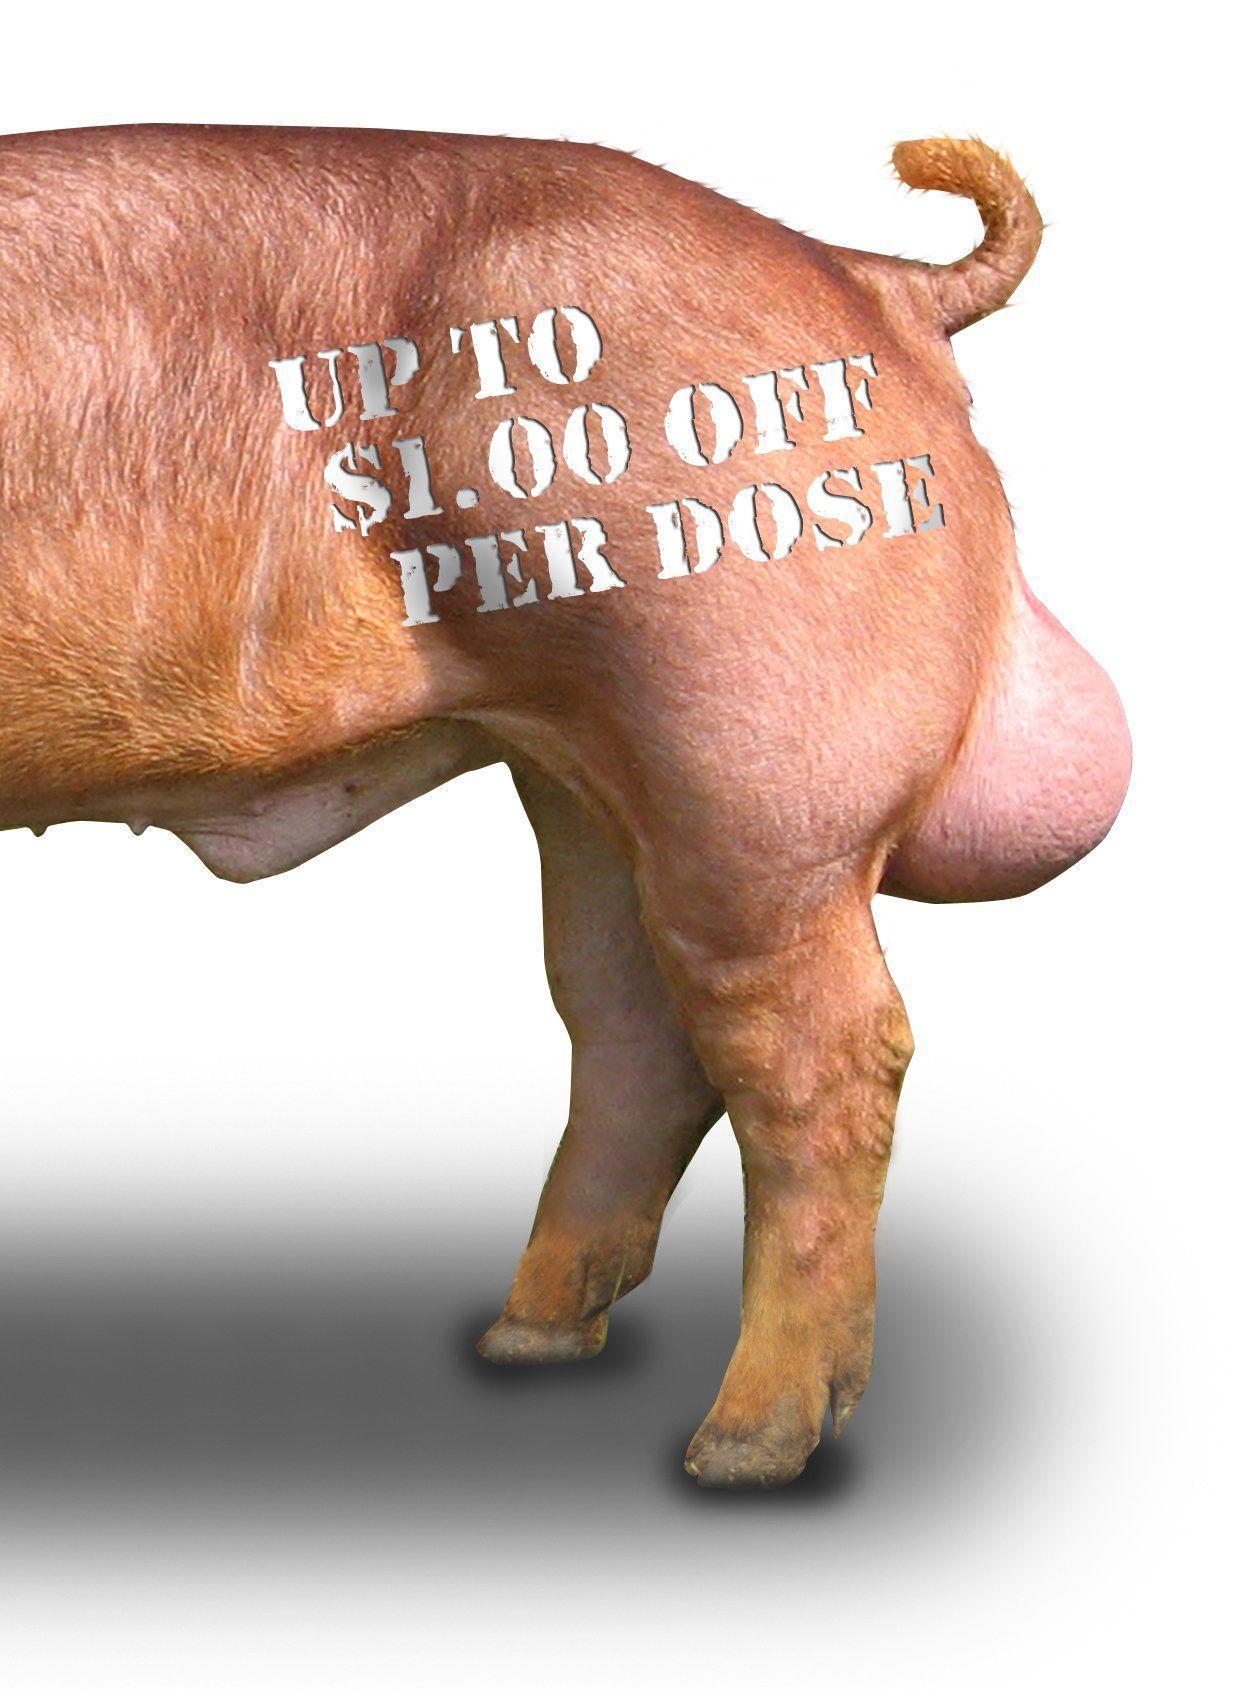 Wonka reccomend Swine sperm for sale